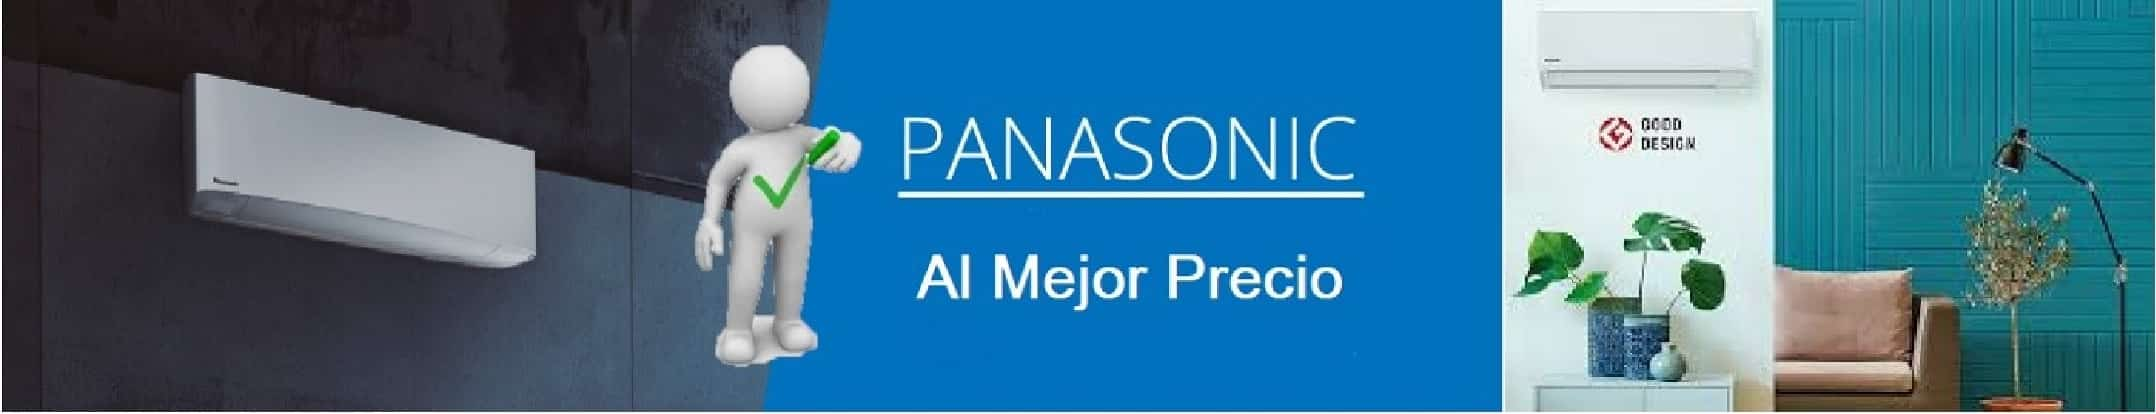 Ofertas en Aire Acondiiconado Panasonic